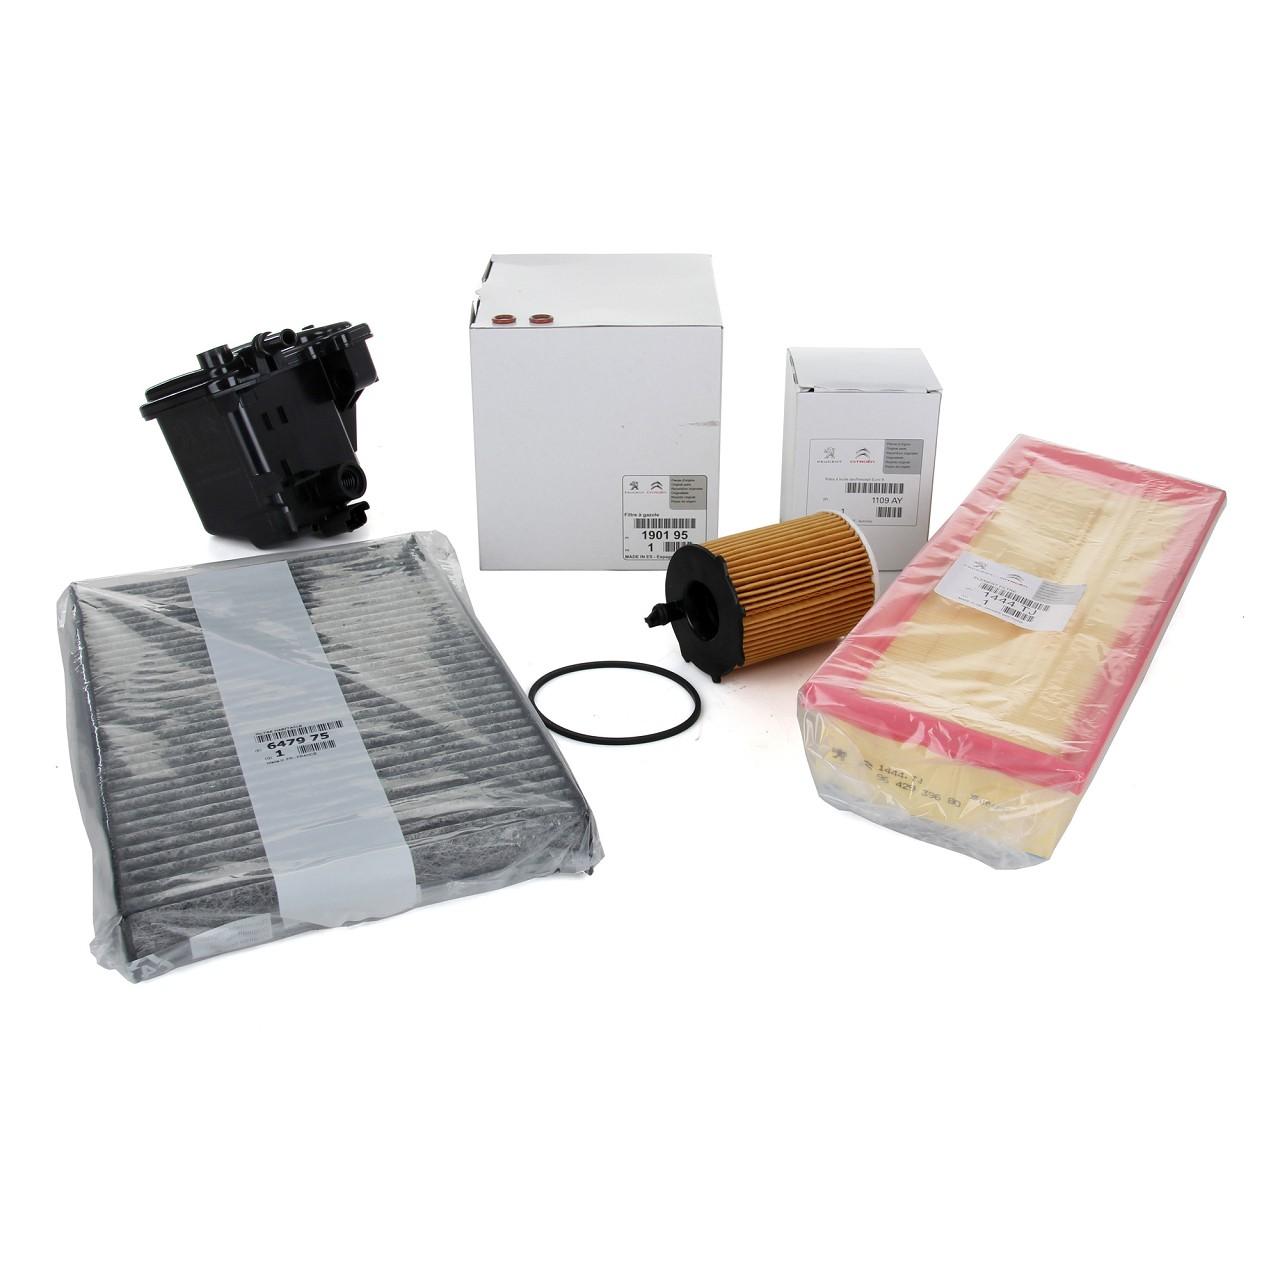 ORIGINAL PEUGEOT CITROEN Inspektionskit Filterset 307 308 C3 C4 1.6HDI 90 109 PS